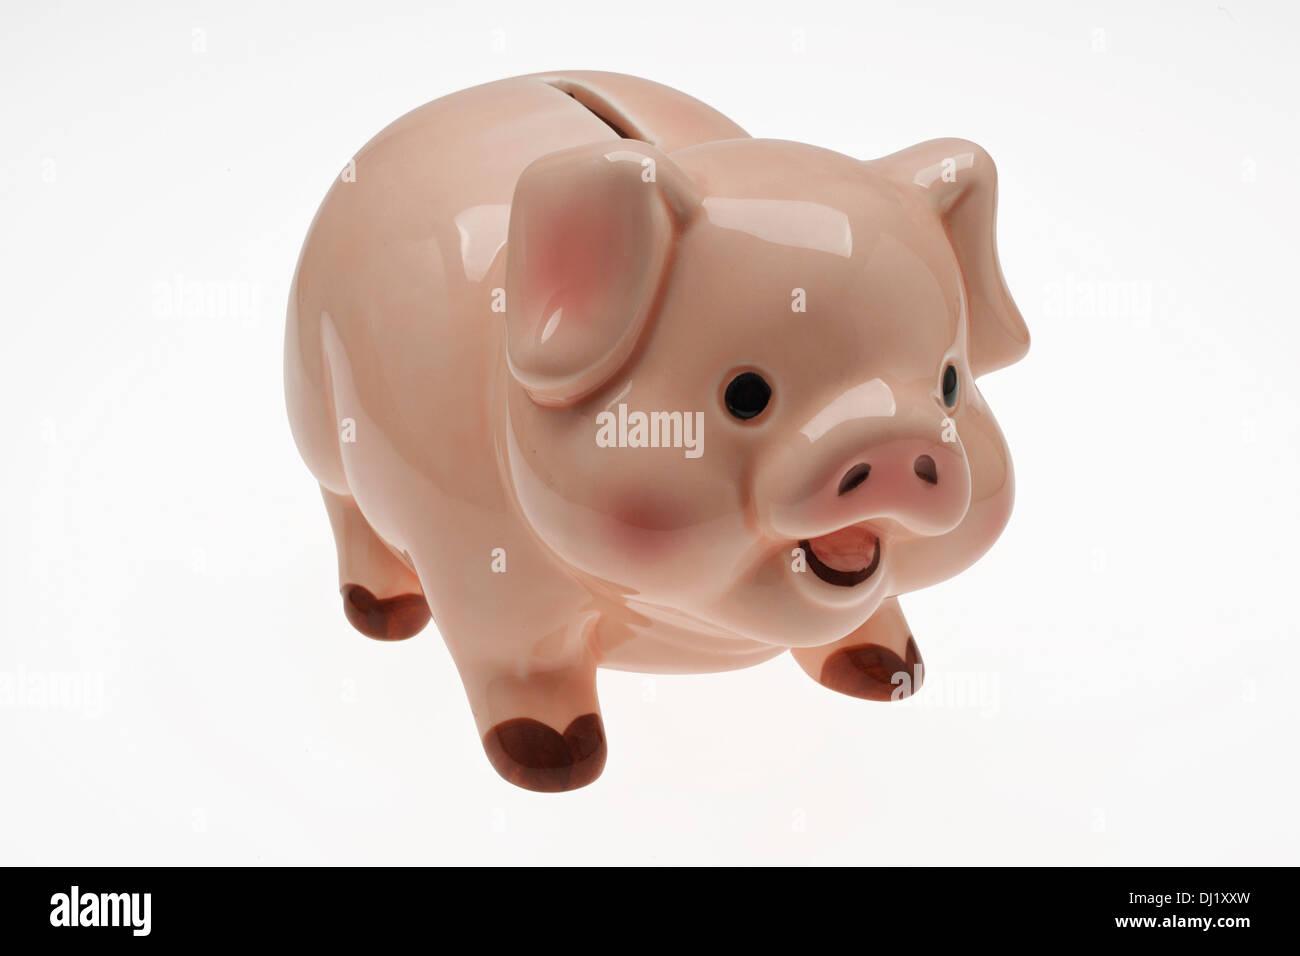 China/ceramic child's savings or piggy bank. - Stock Image